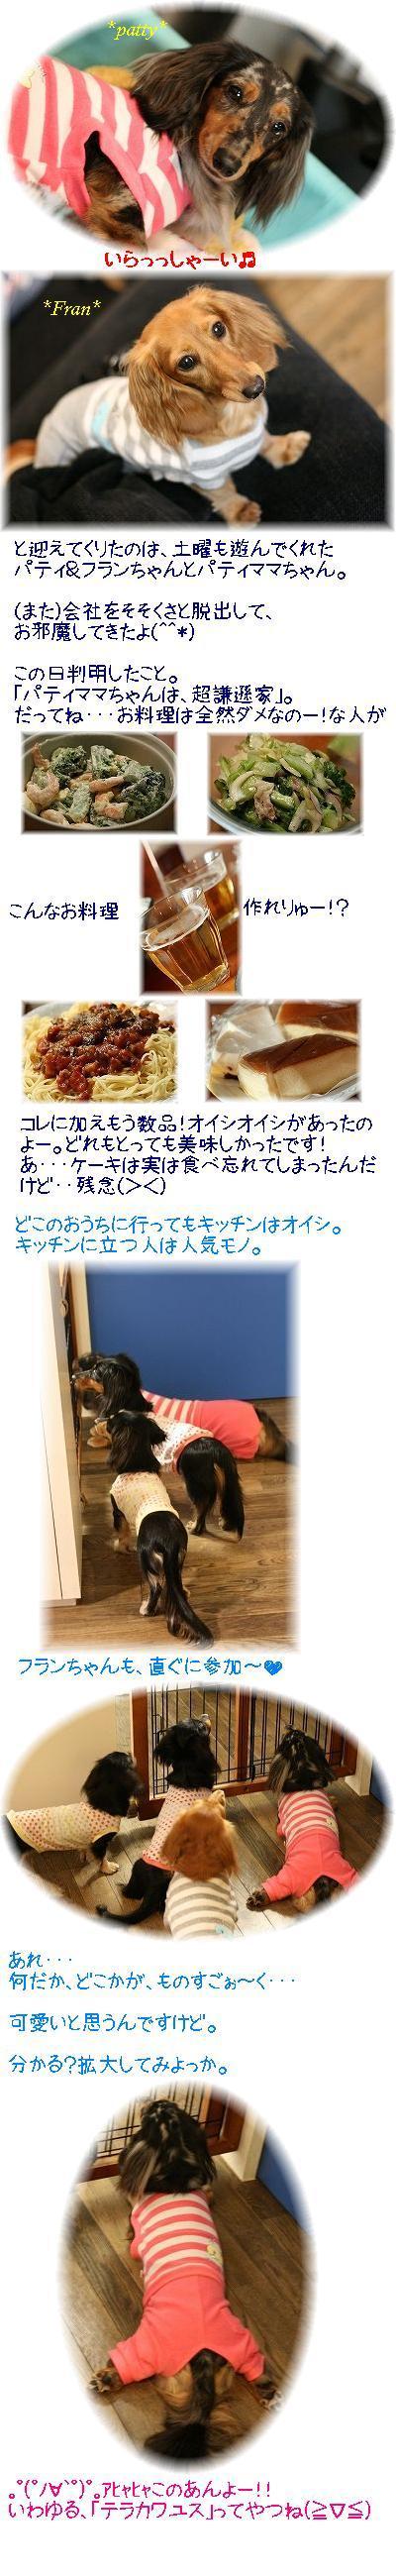 IMG_1551a.jpg